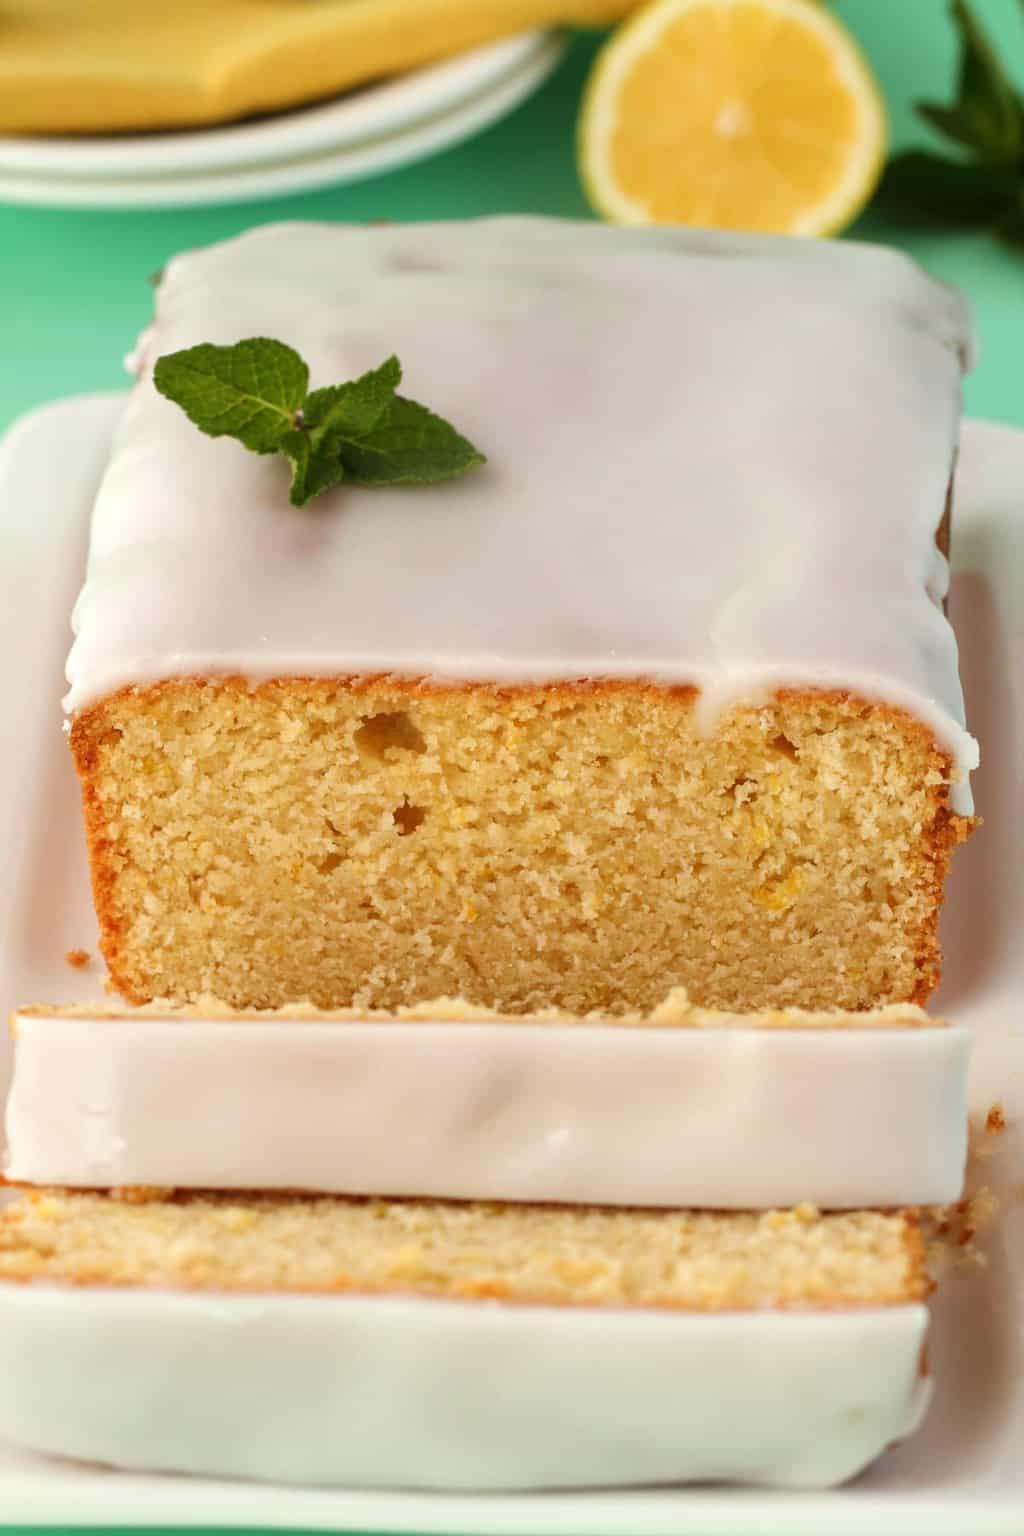 Vegetarian Lemon Cake Recipe  Vegan Lemon Pound Cake with Lemon Glaze Loving It Vegan